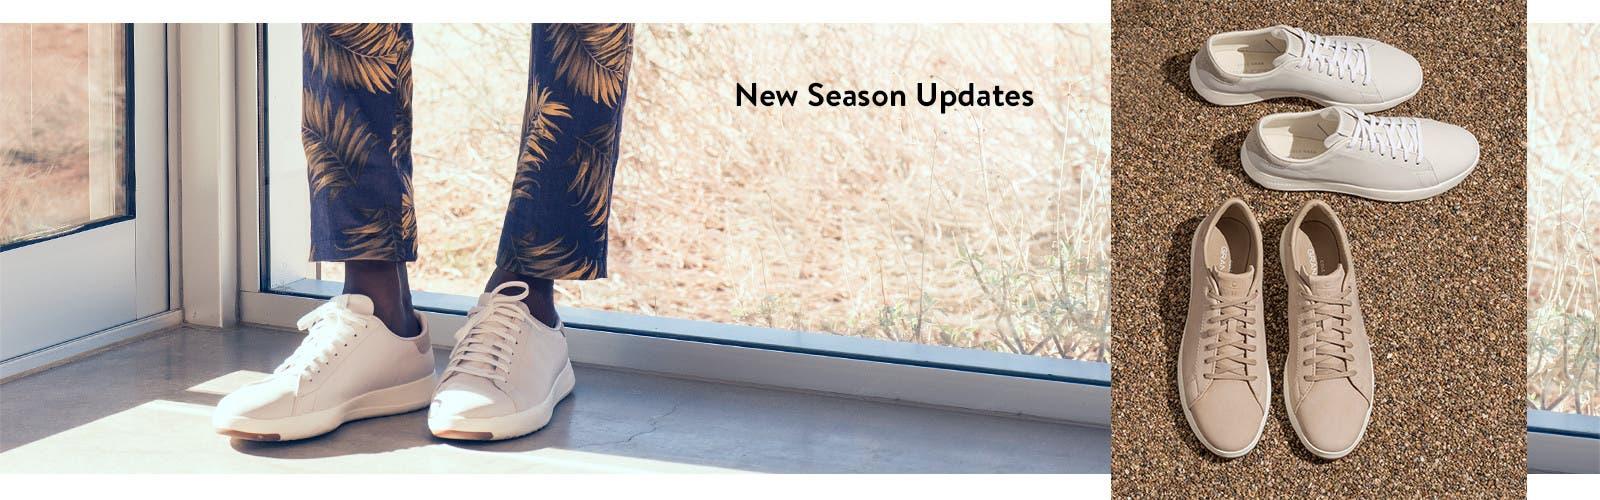 New season updates.